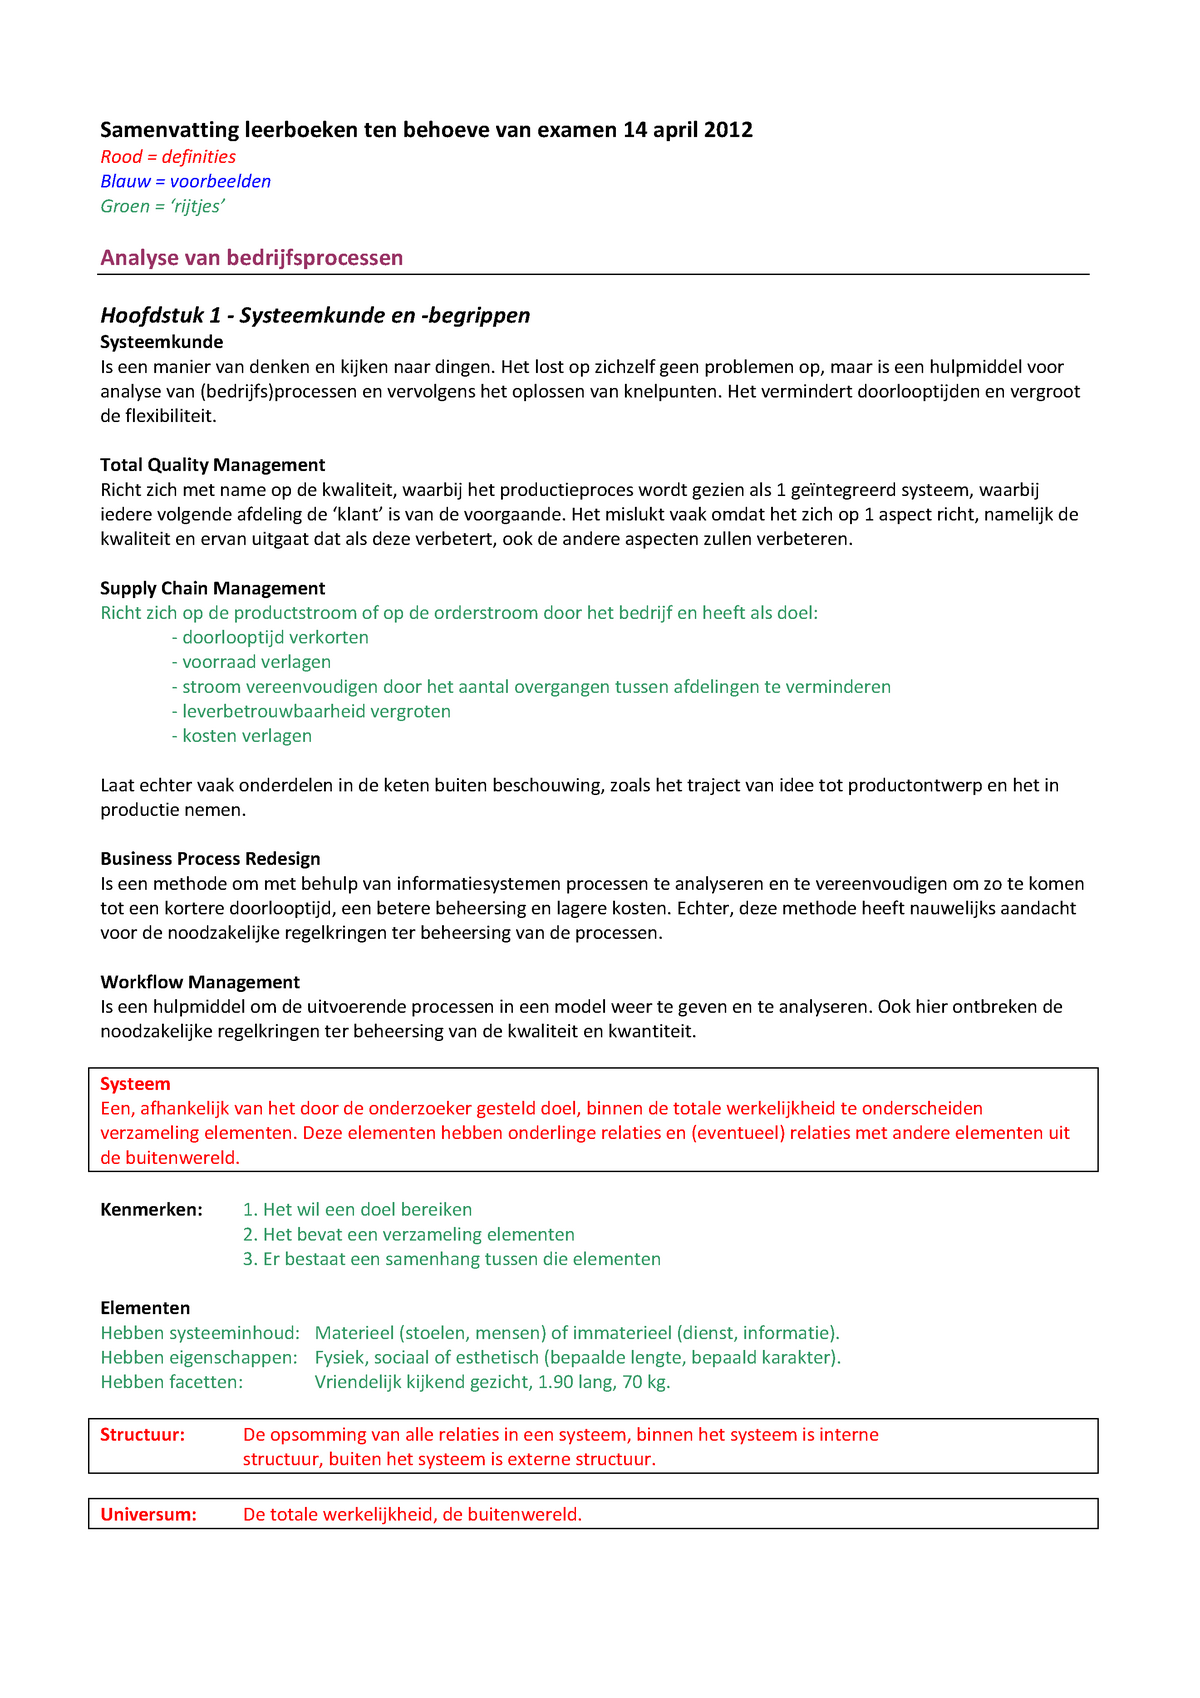 65a961840b9026 Samenvatting analyse van bedrijfsprocessen J. in 't - StudeerSnel.nl